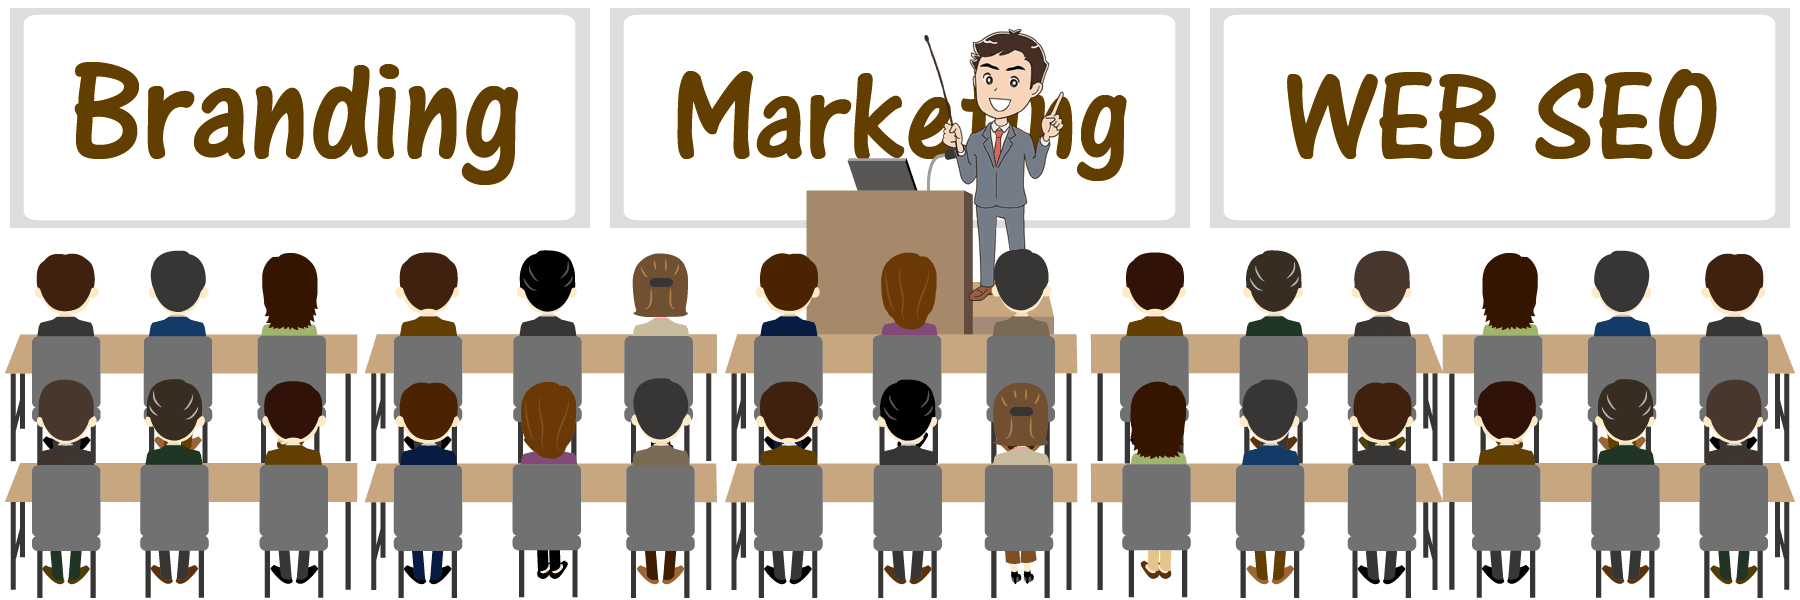 SEO対策で中小零細企業や個人事業主が巨大サイトを倒す!? | ブランディング実務士資格講座